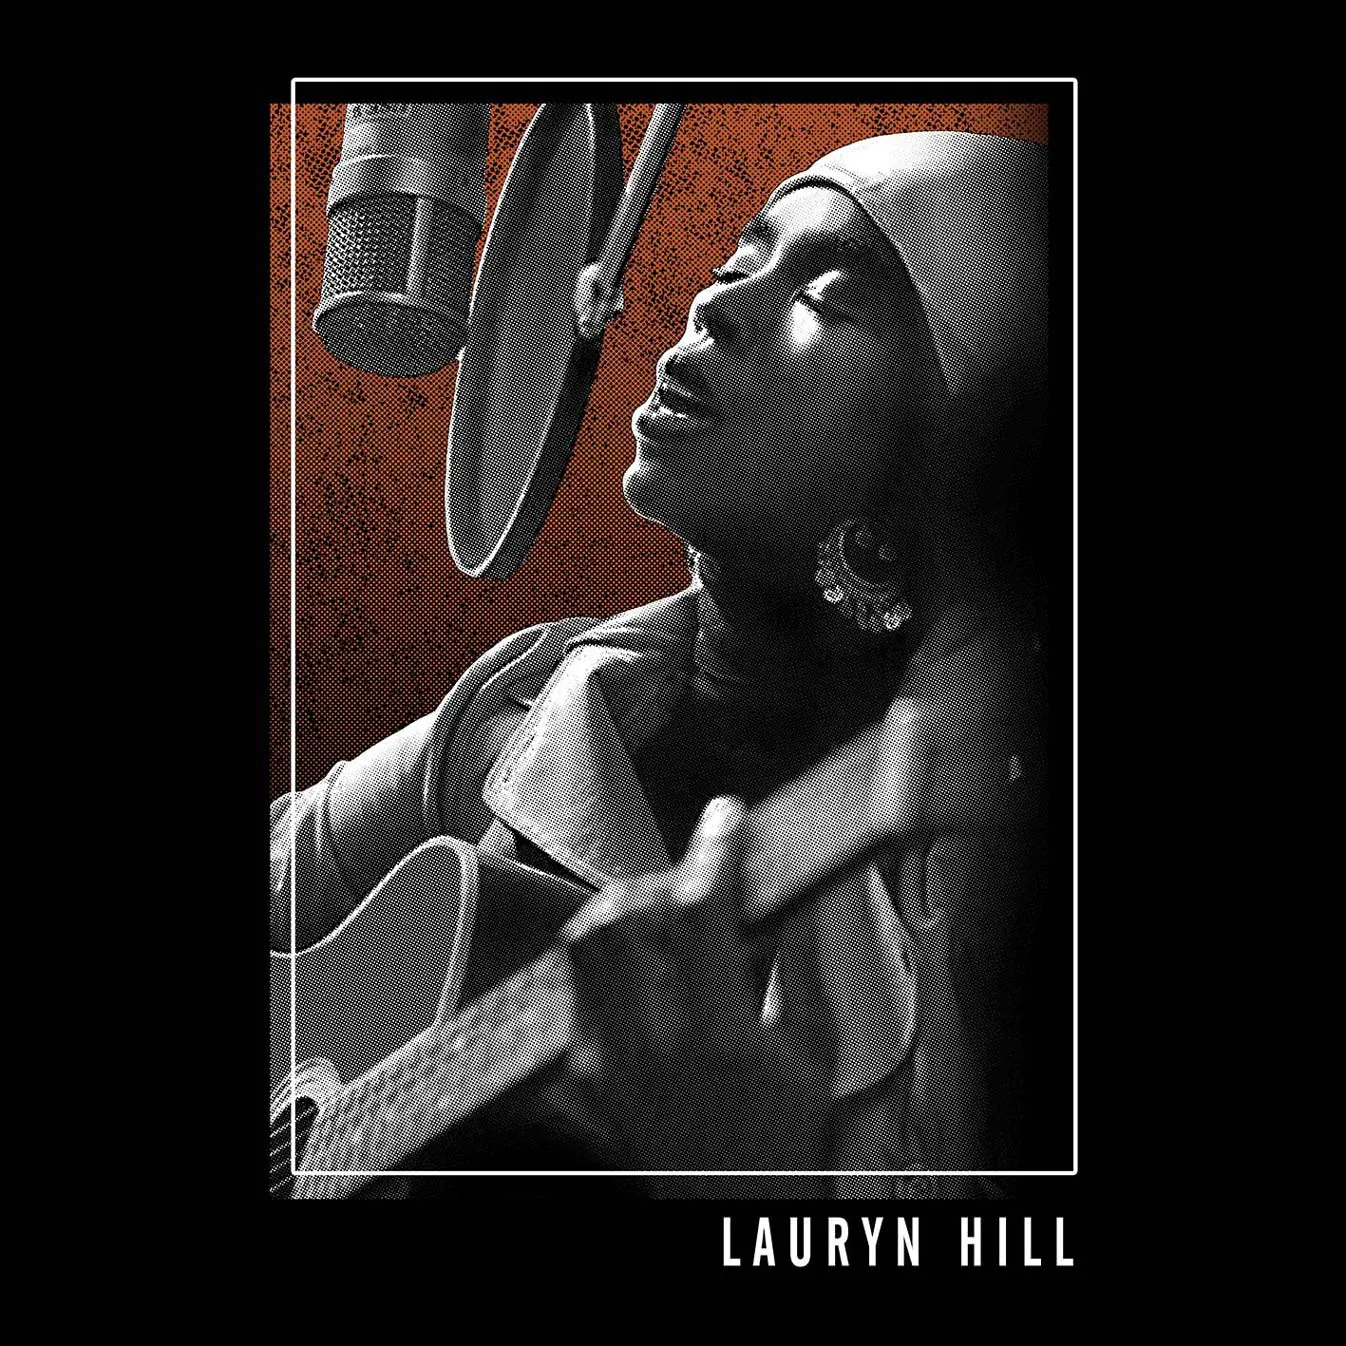 Quadro A4 - Lauryn Hill